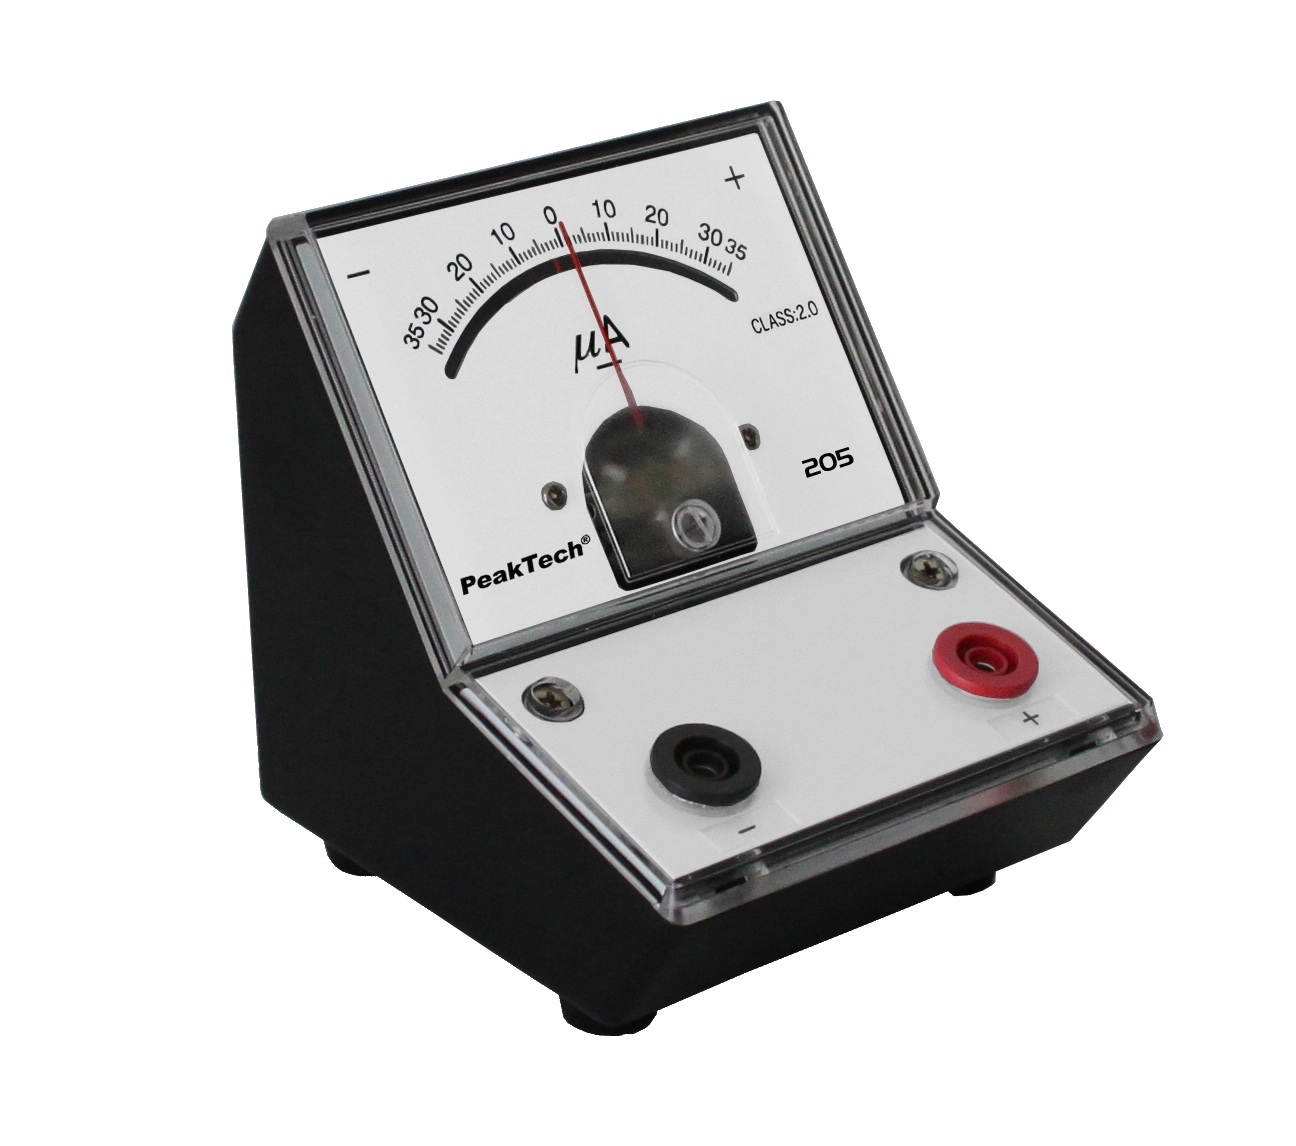 «PeakTech® P 205-08» Analog galvanometer +/- 35µA DC